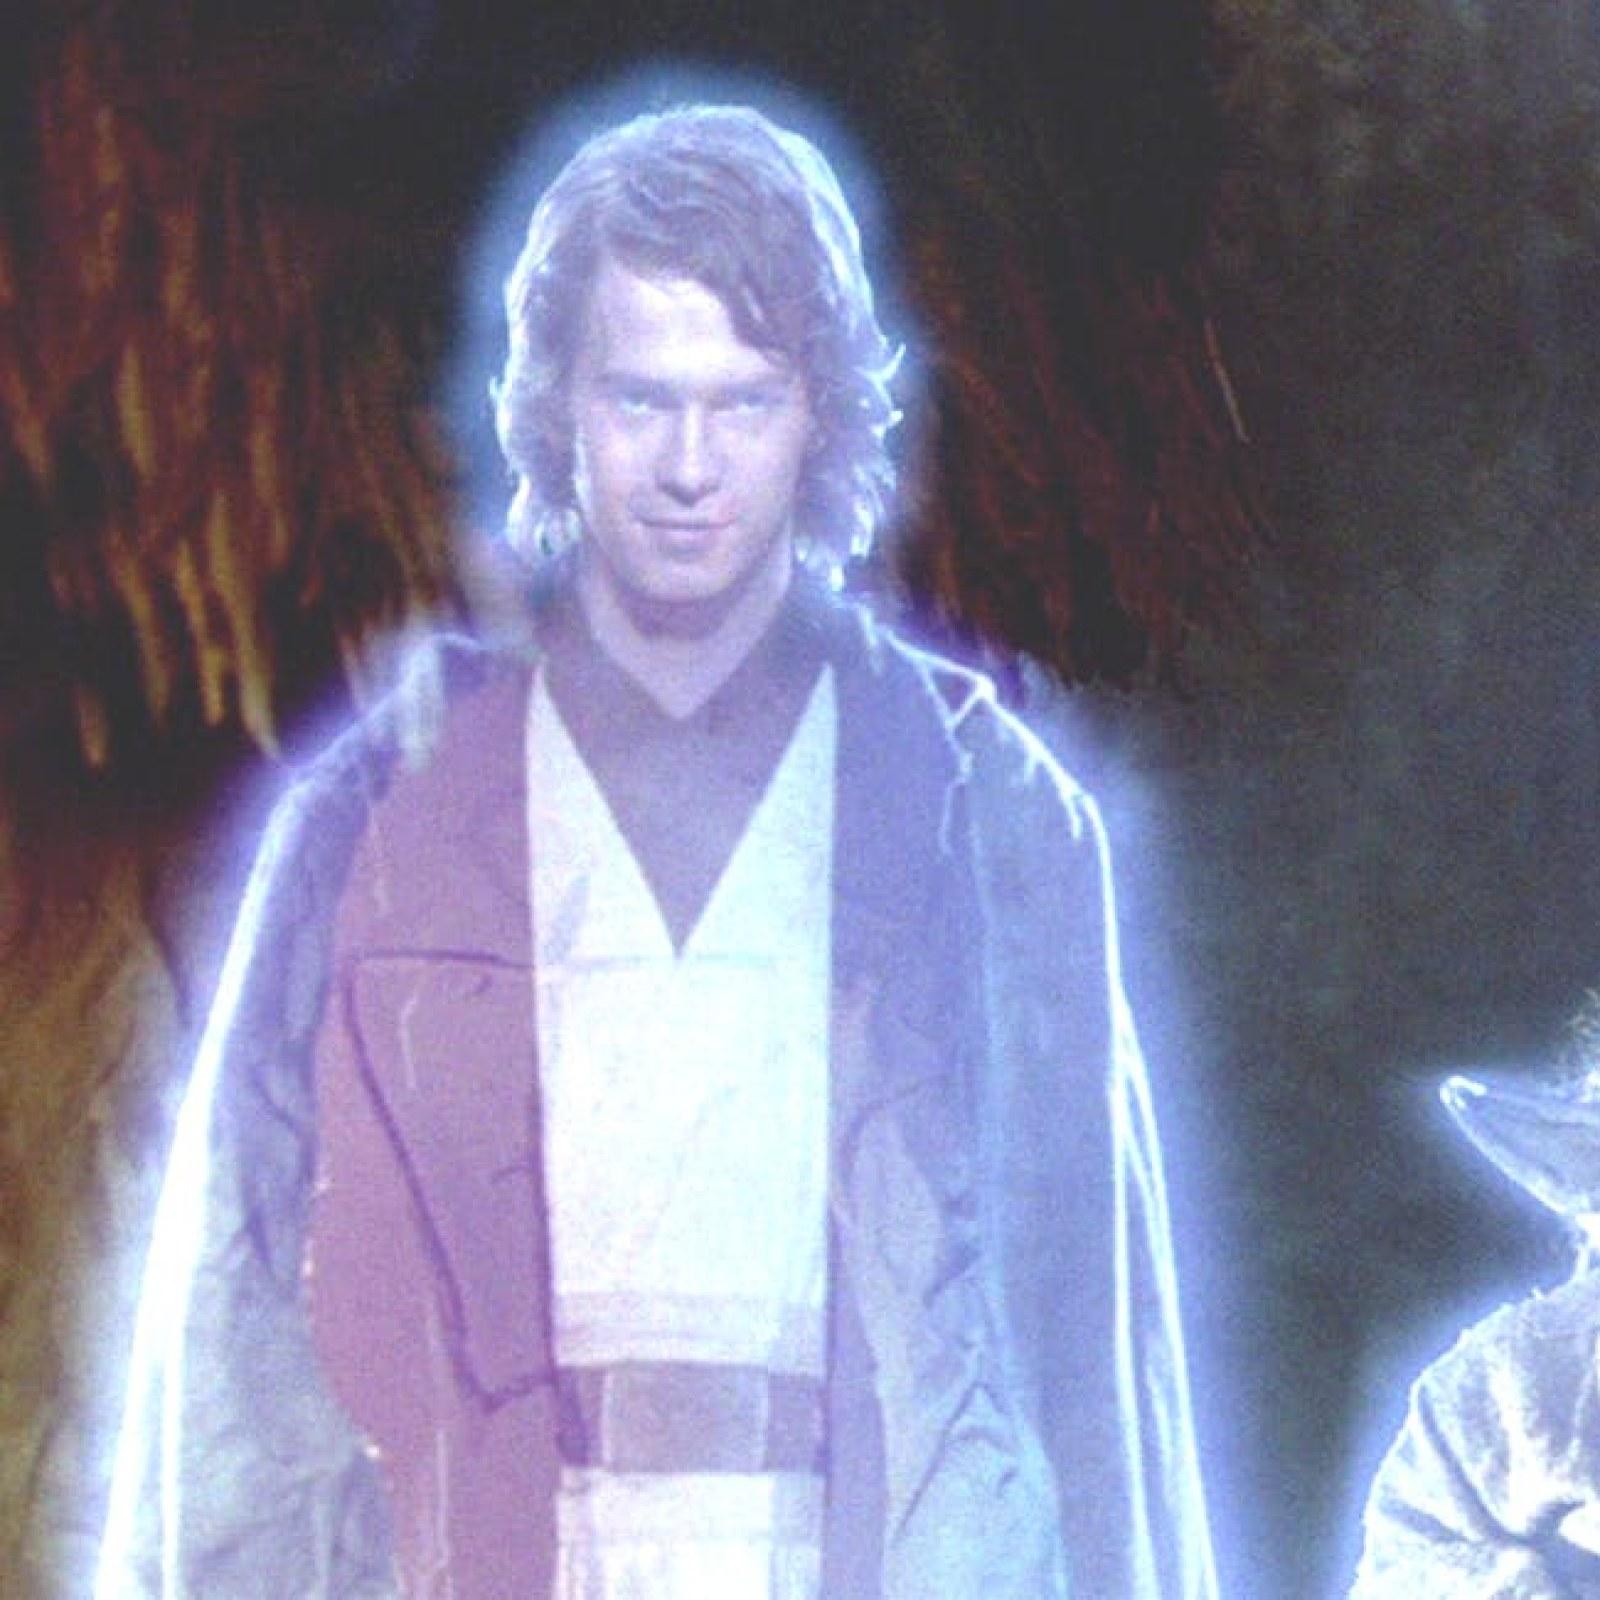 Will Anakin Return In The Rise Of Skywalker Hayden Christensen Sighting Prompts Star Wars Rumors